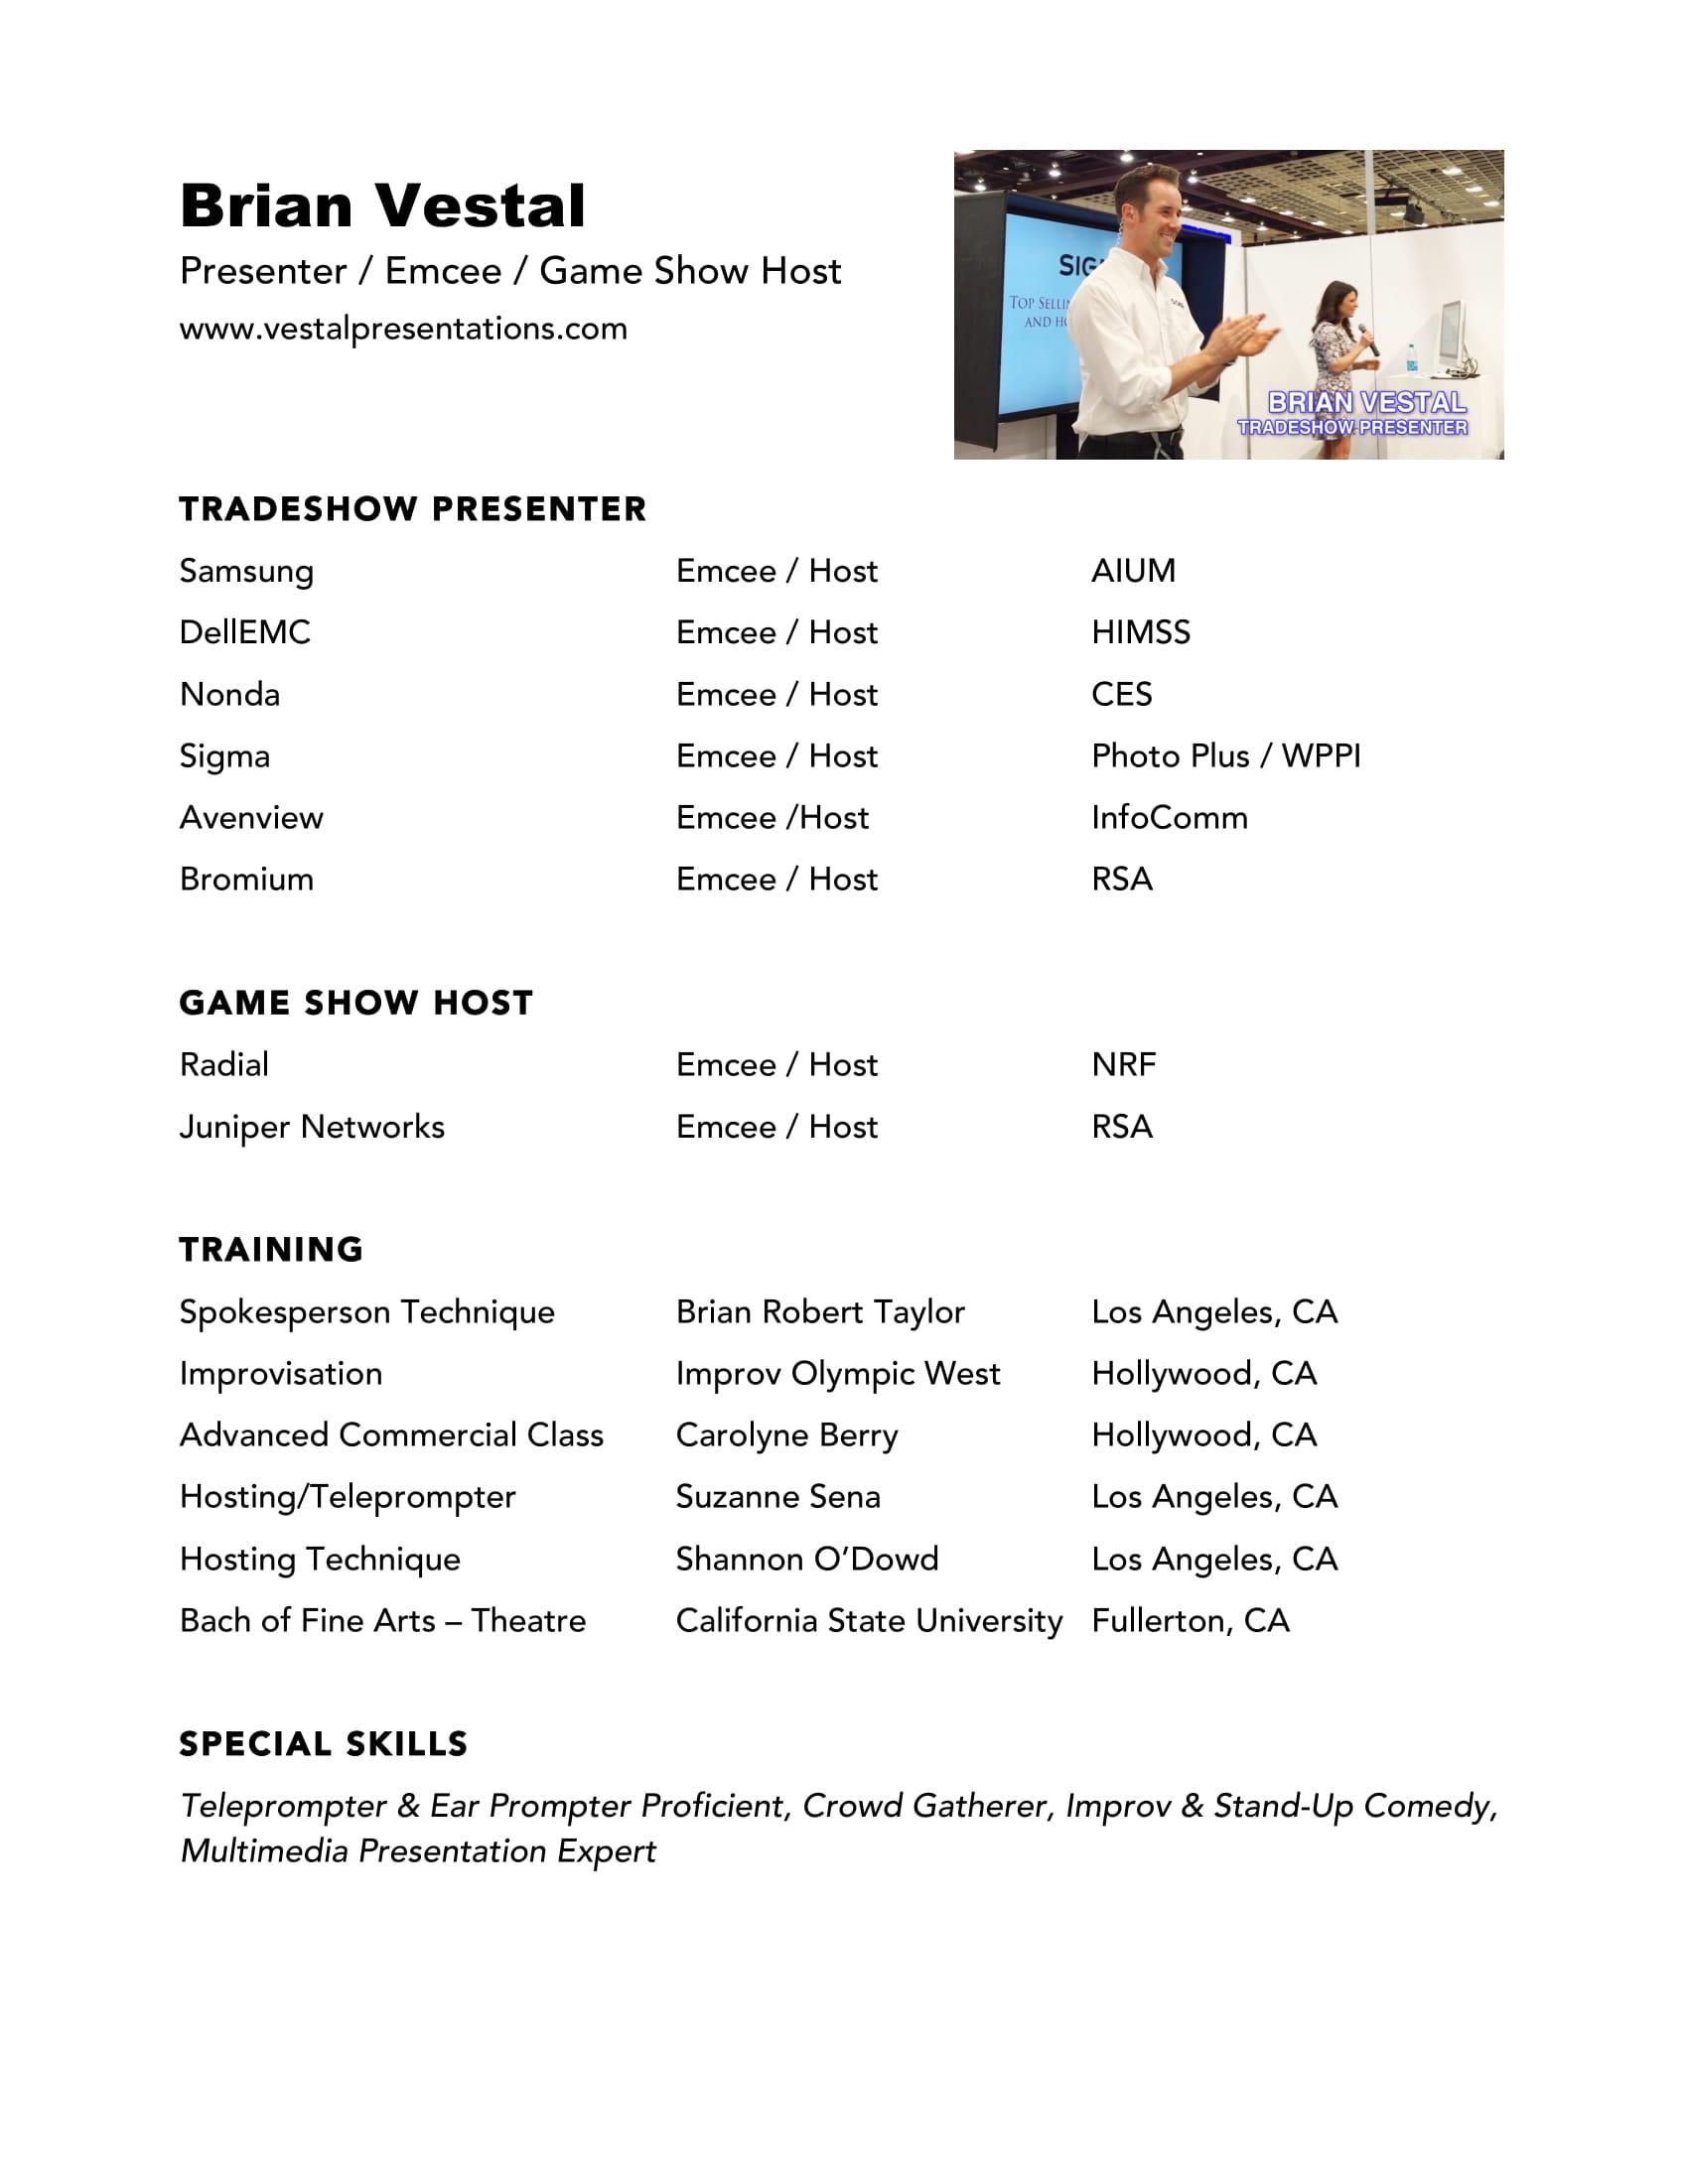 Brian Vestal Tradeshow Resume WEB.jpg